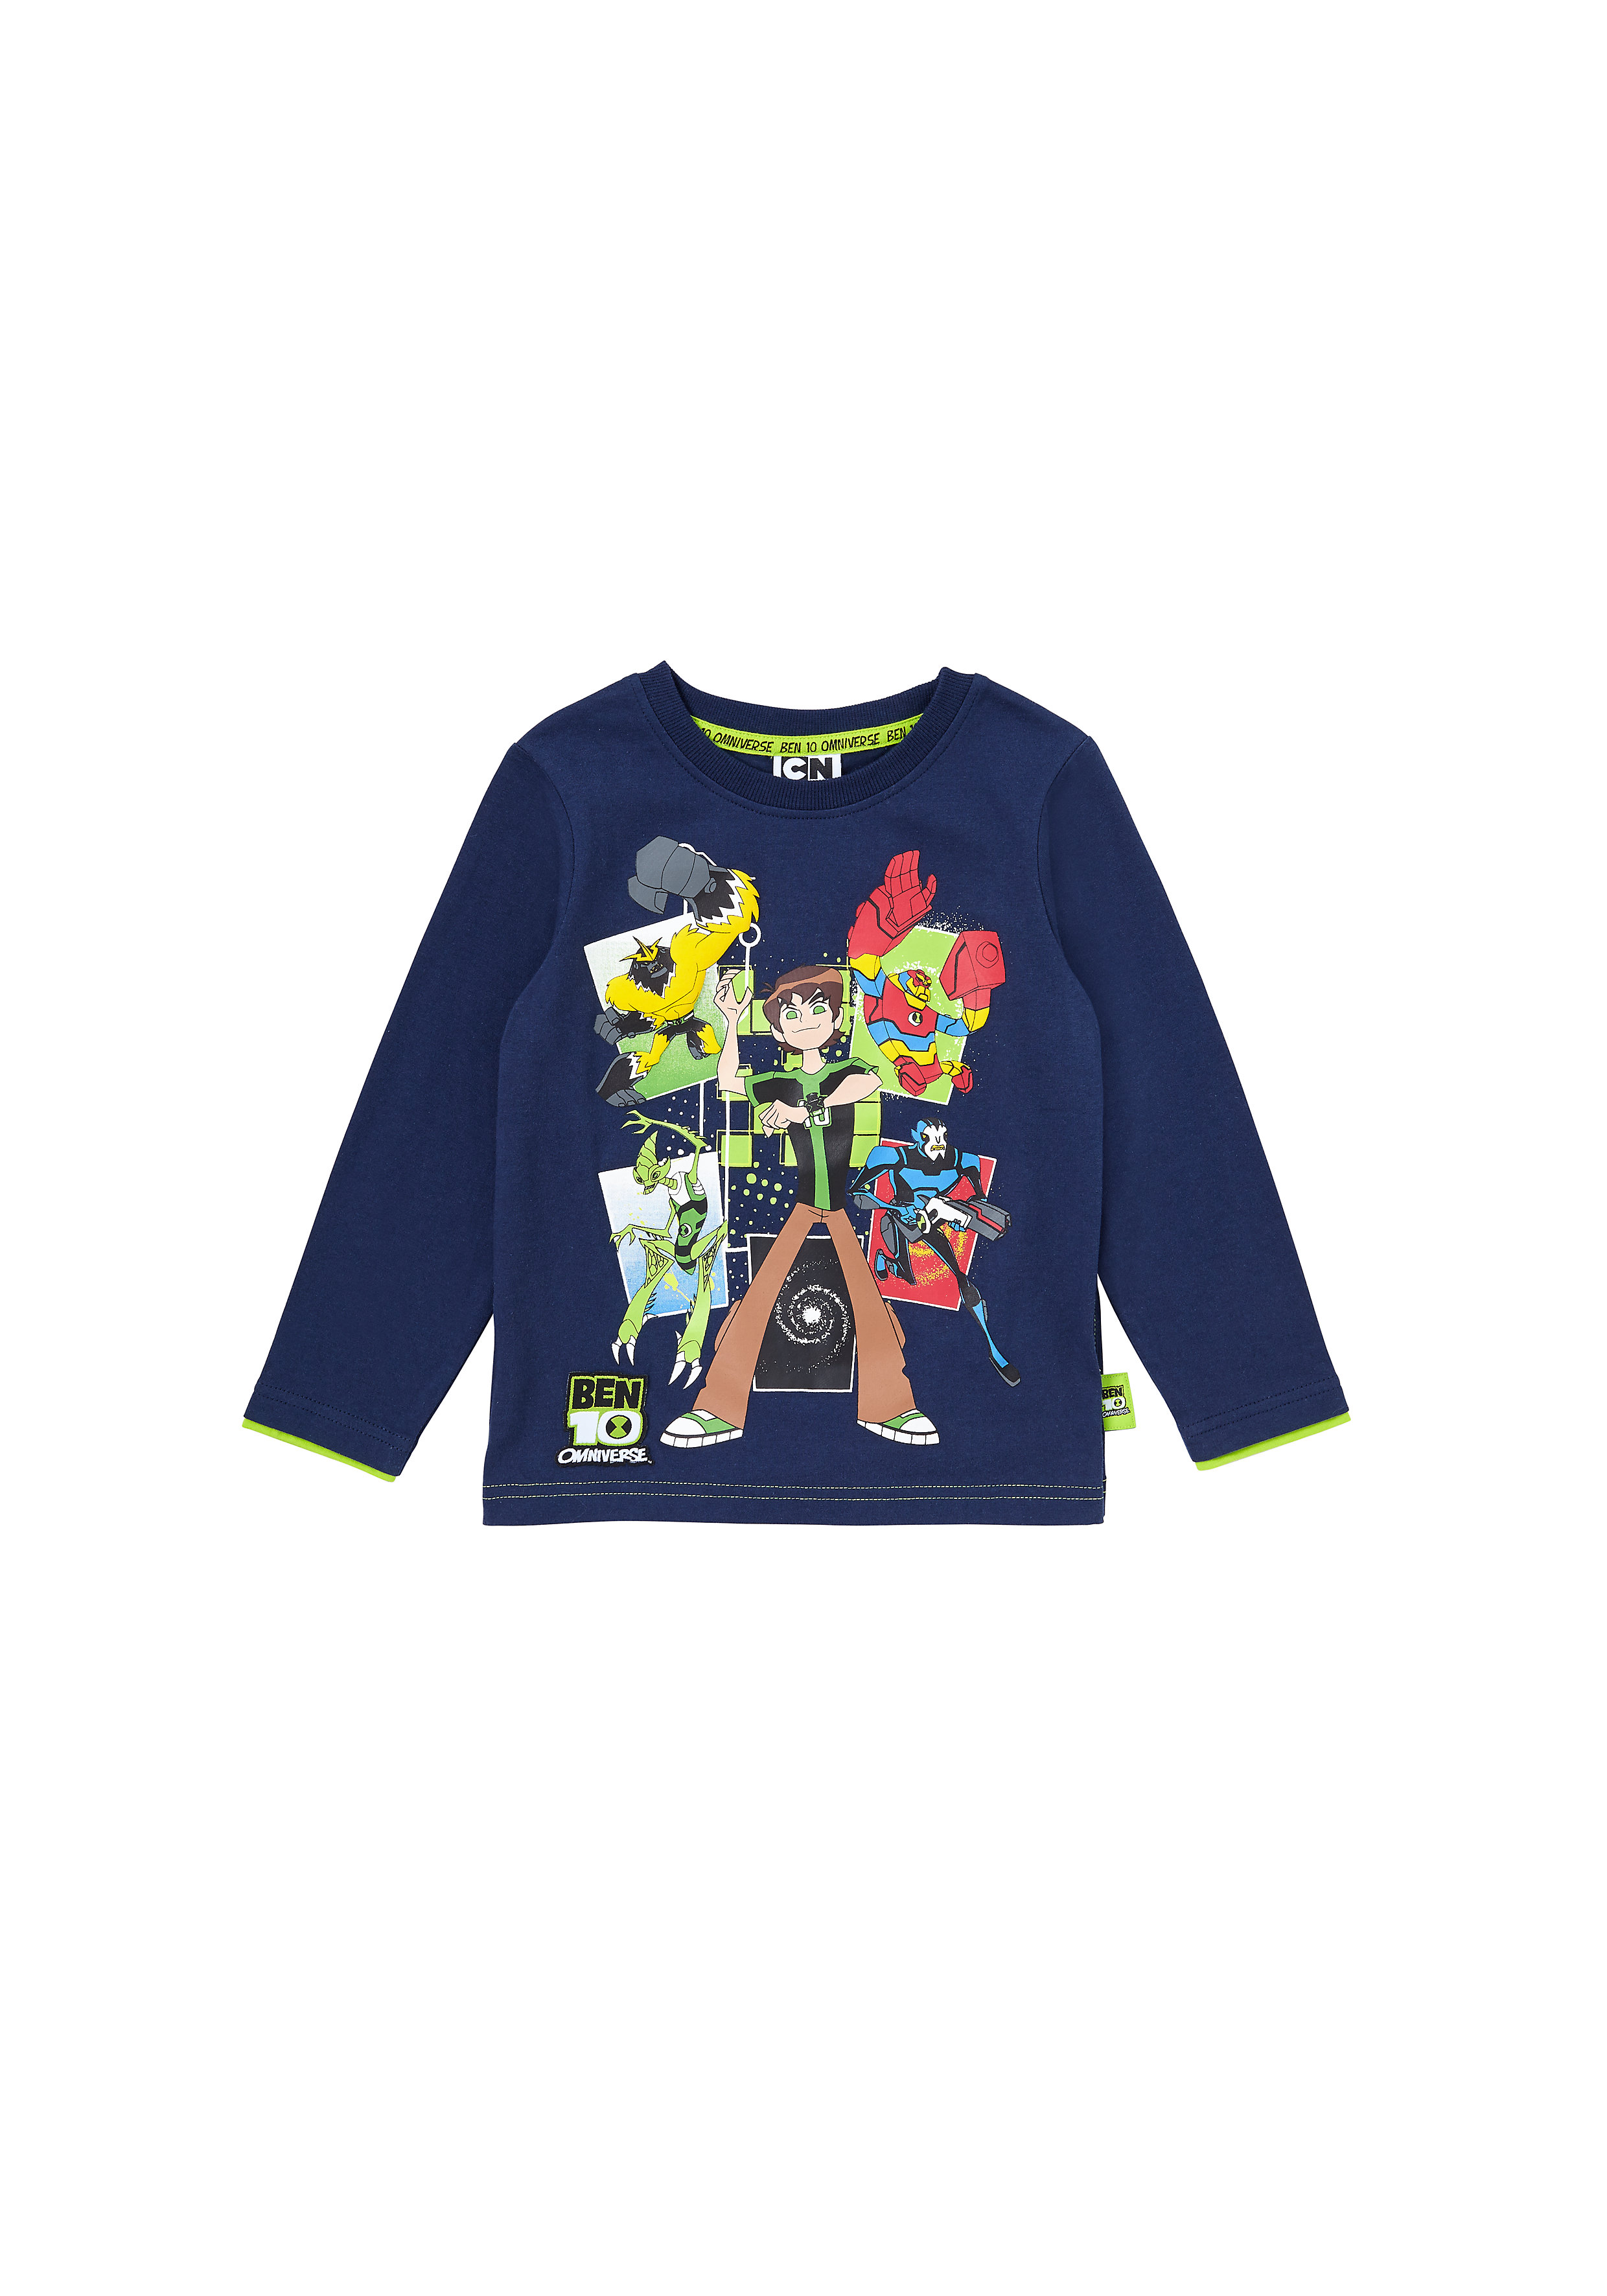 Mothercare | Boys Full Sleeves T-Shirt Ben 10 Print - Navy